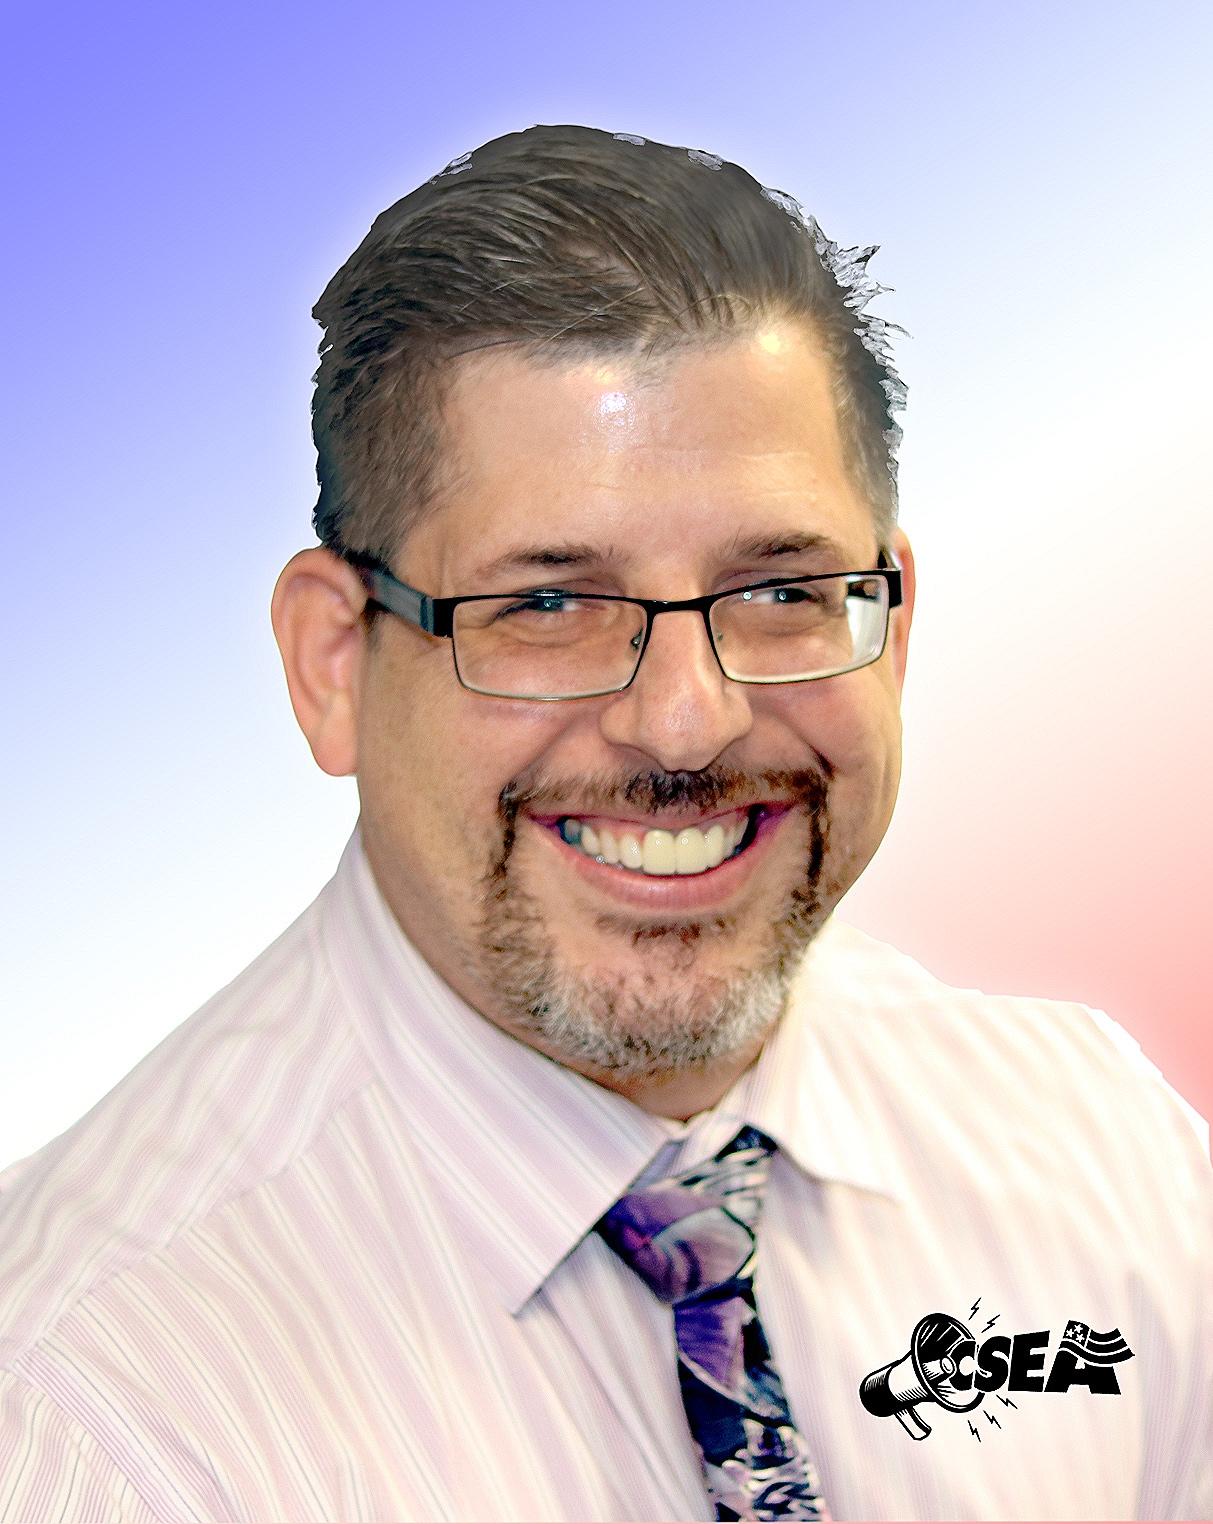 JohnAloisio - CSEA Local 830 Vice President • Treasurer's Office Unit President • Grievance Chairman